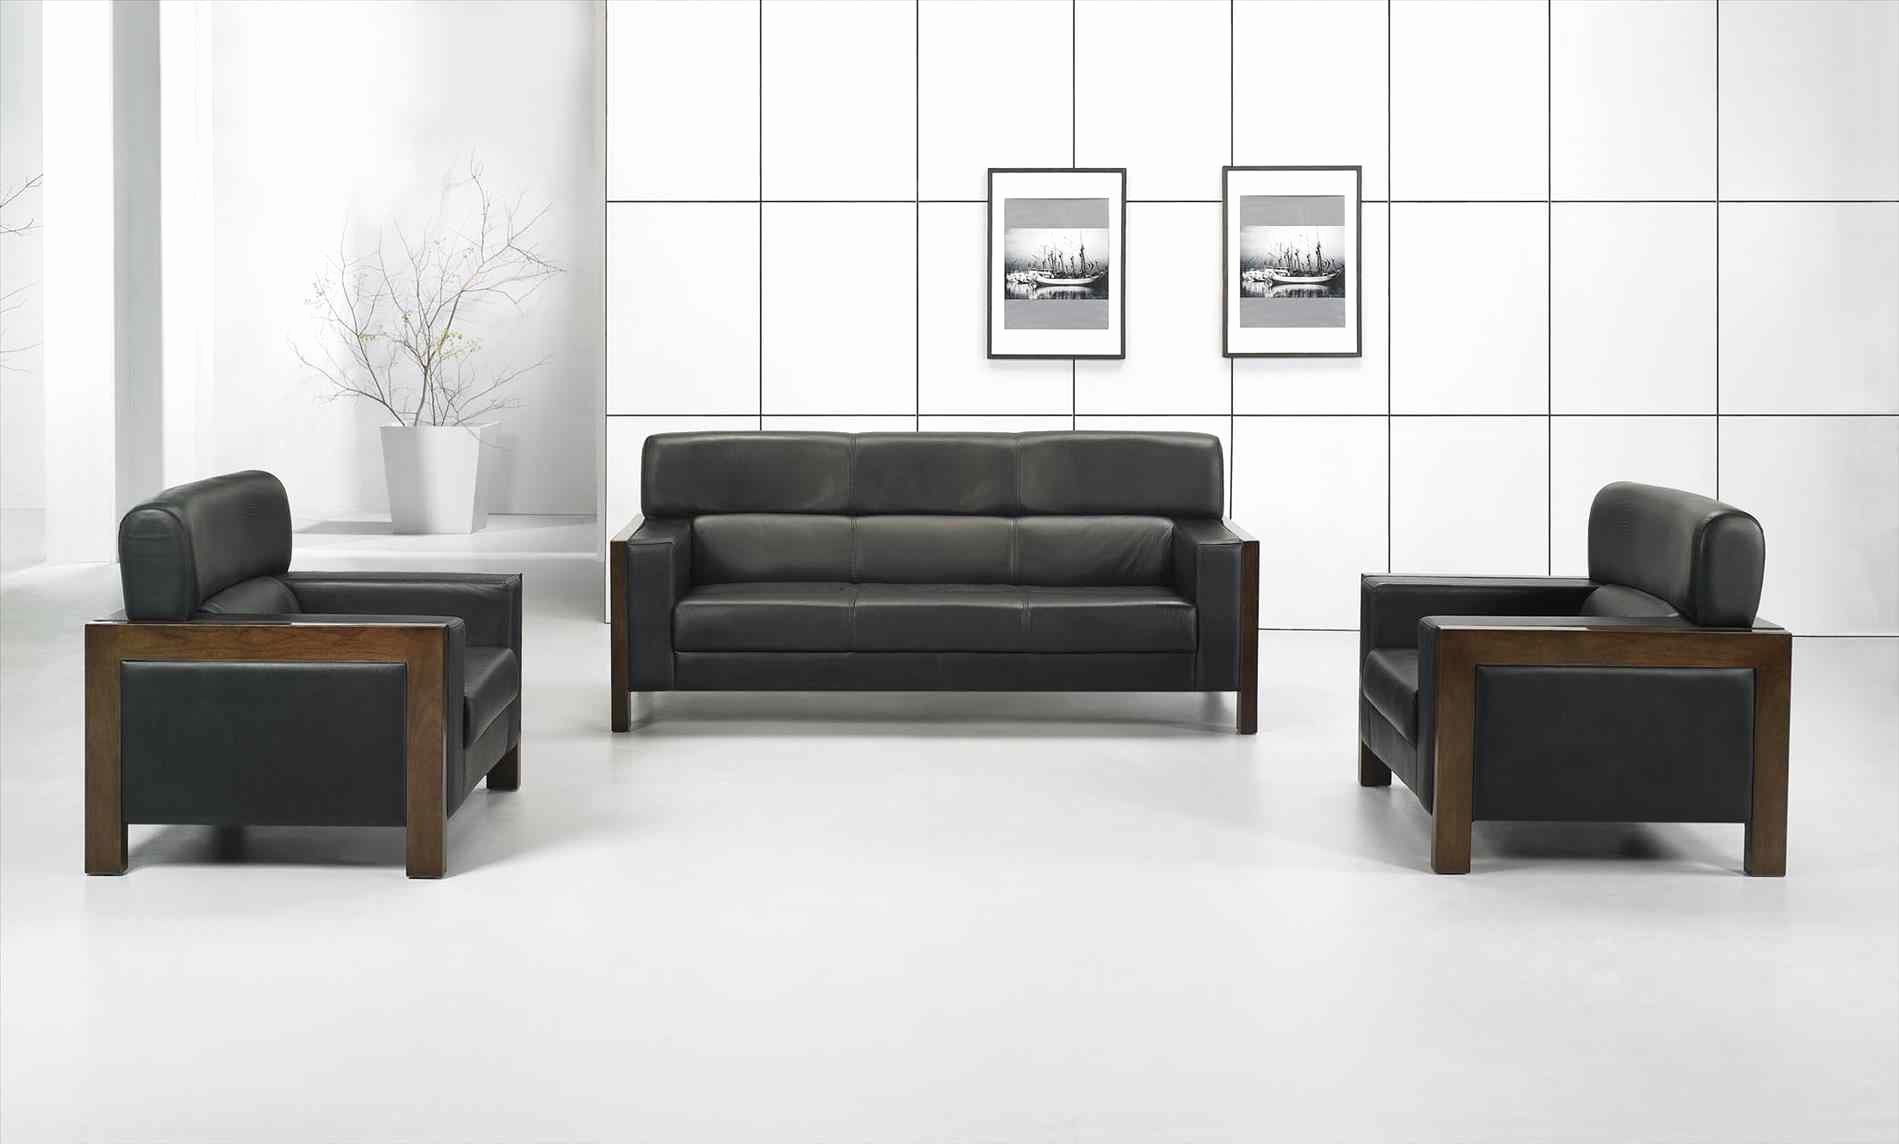 Modern Office Sofa Designs In 2020 Office Sofa Design Home Office Design Sofa Design